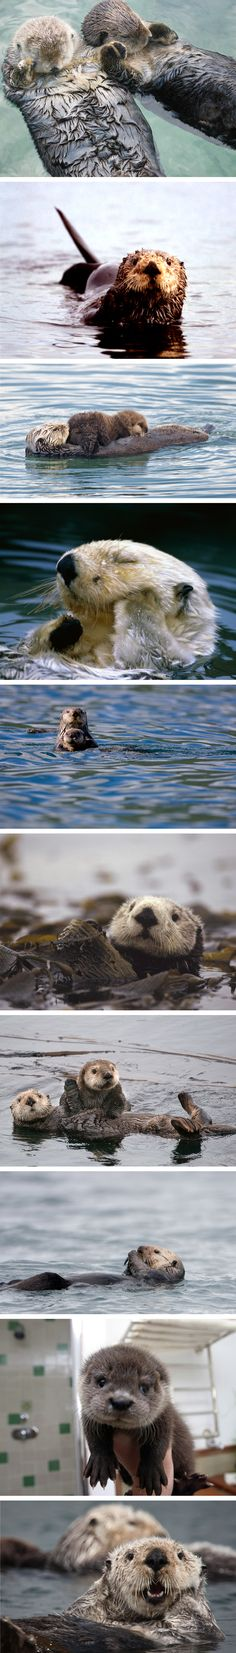 Sea otters.... perhaps the cutest animal alive!